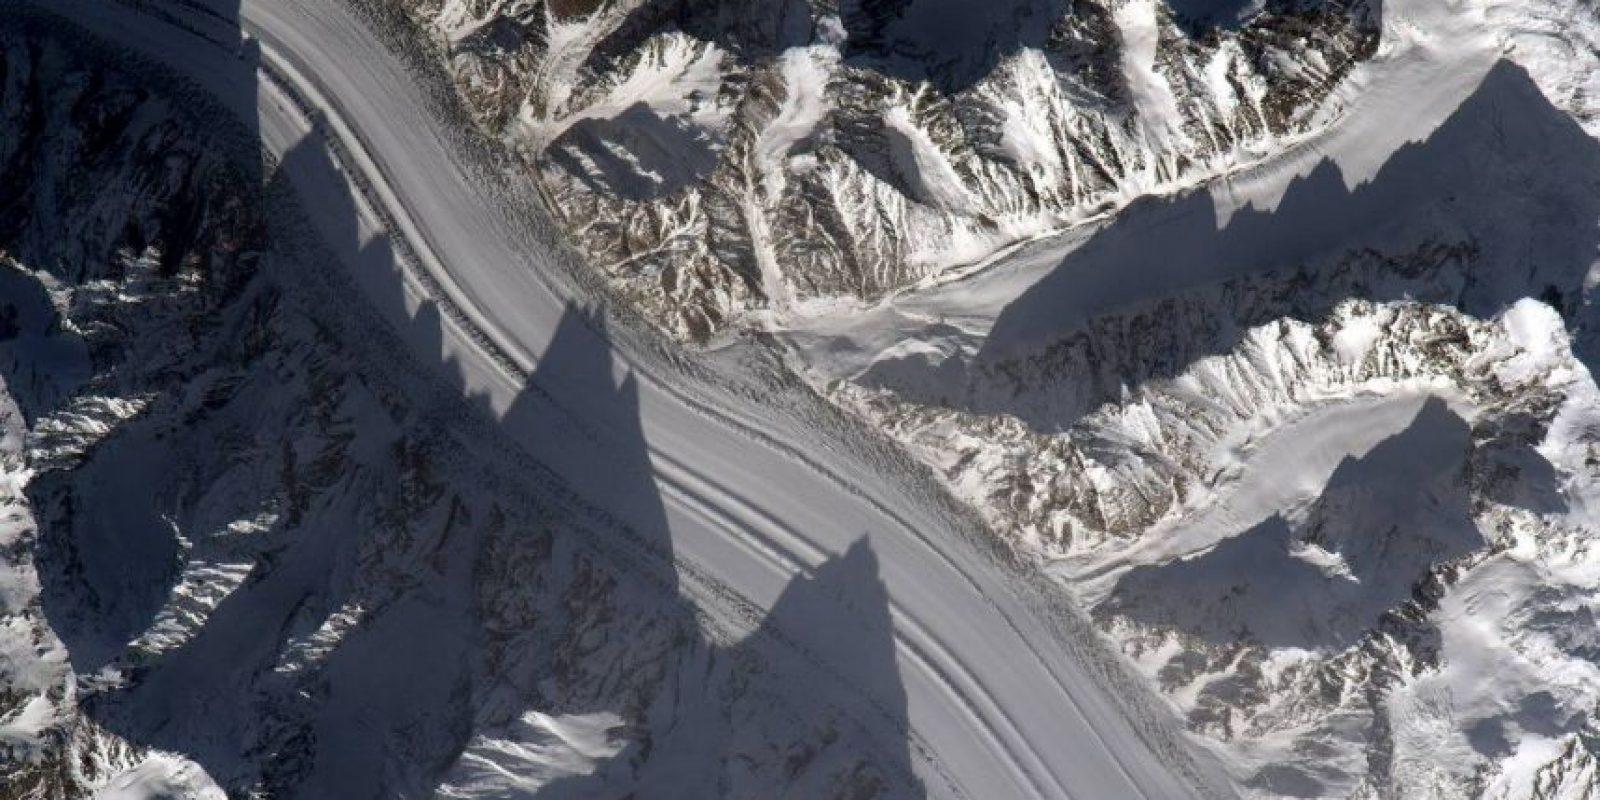 Así luce Tajikistán, en Asia Central Foto:Facebook.com/pages/NASA-Astronaut-Scott-Kelly